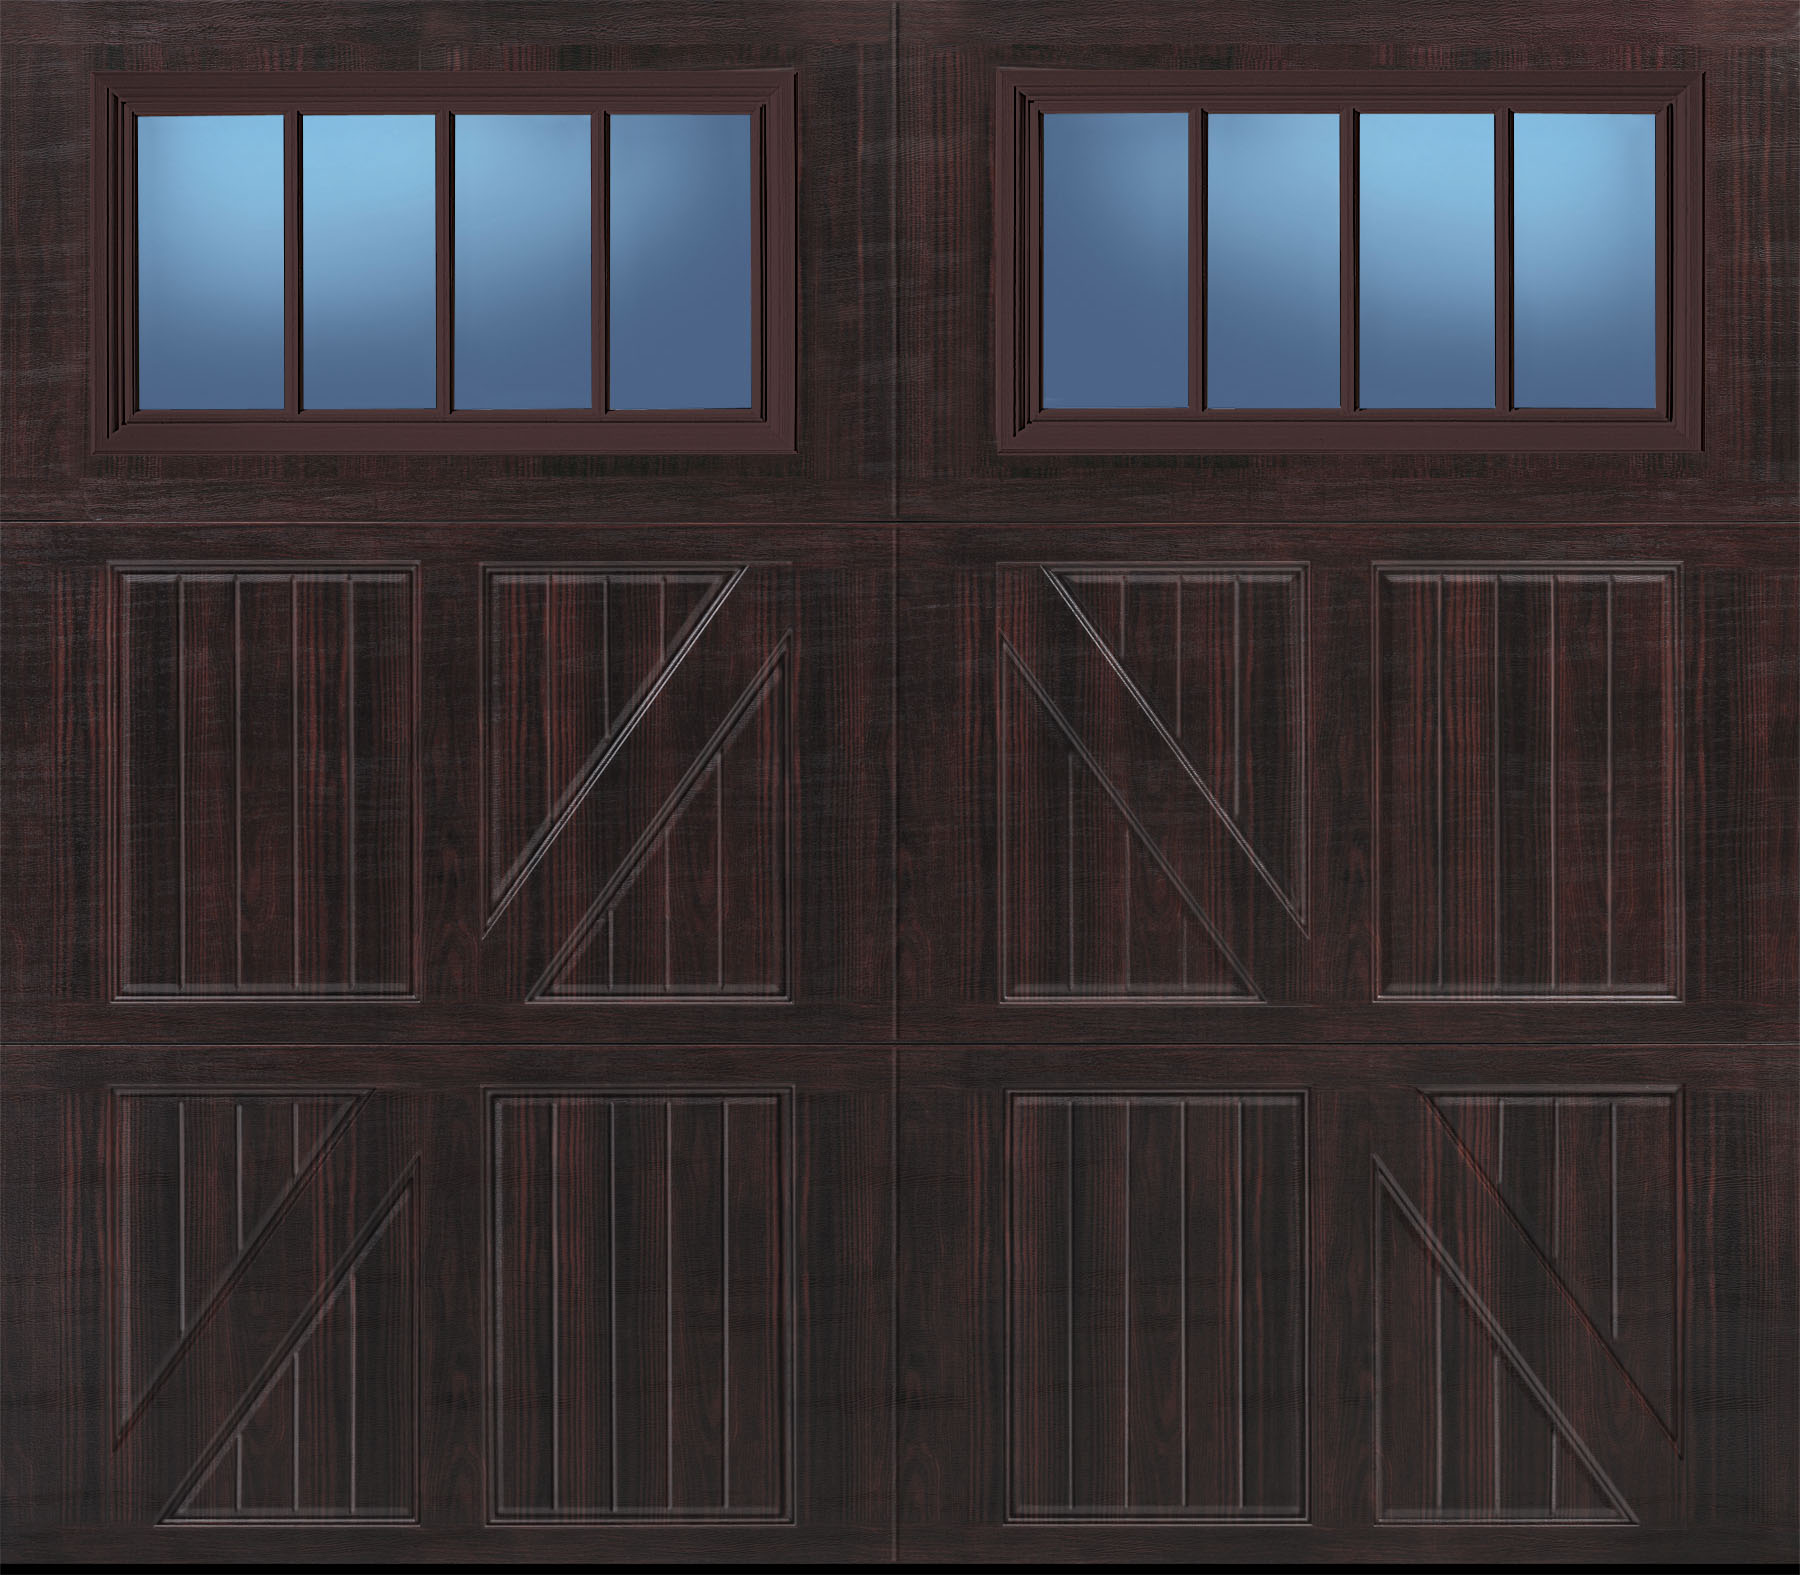 1575 #2E709D Amarr Carriage House Garage Doors Superior Garage Doors Of Atlanta save image Amarr Commercial Doors 36671800